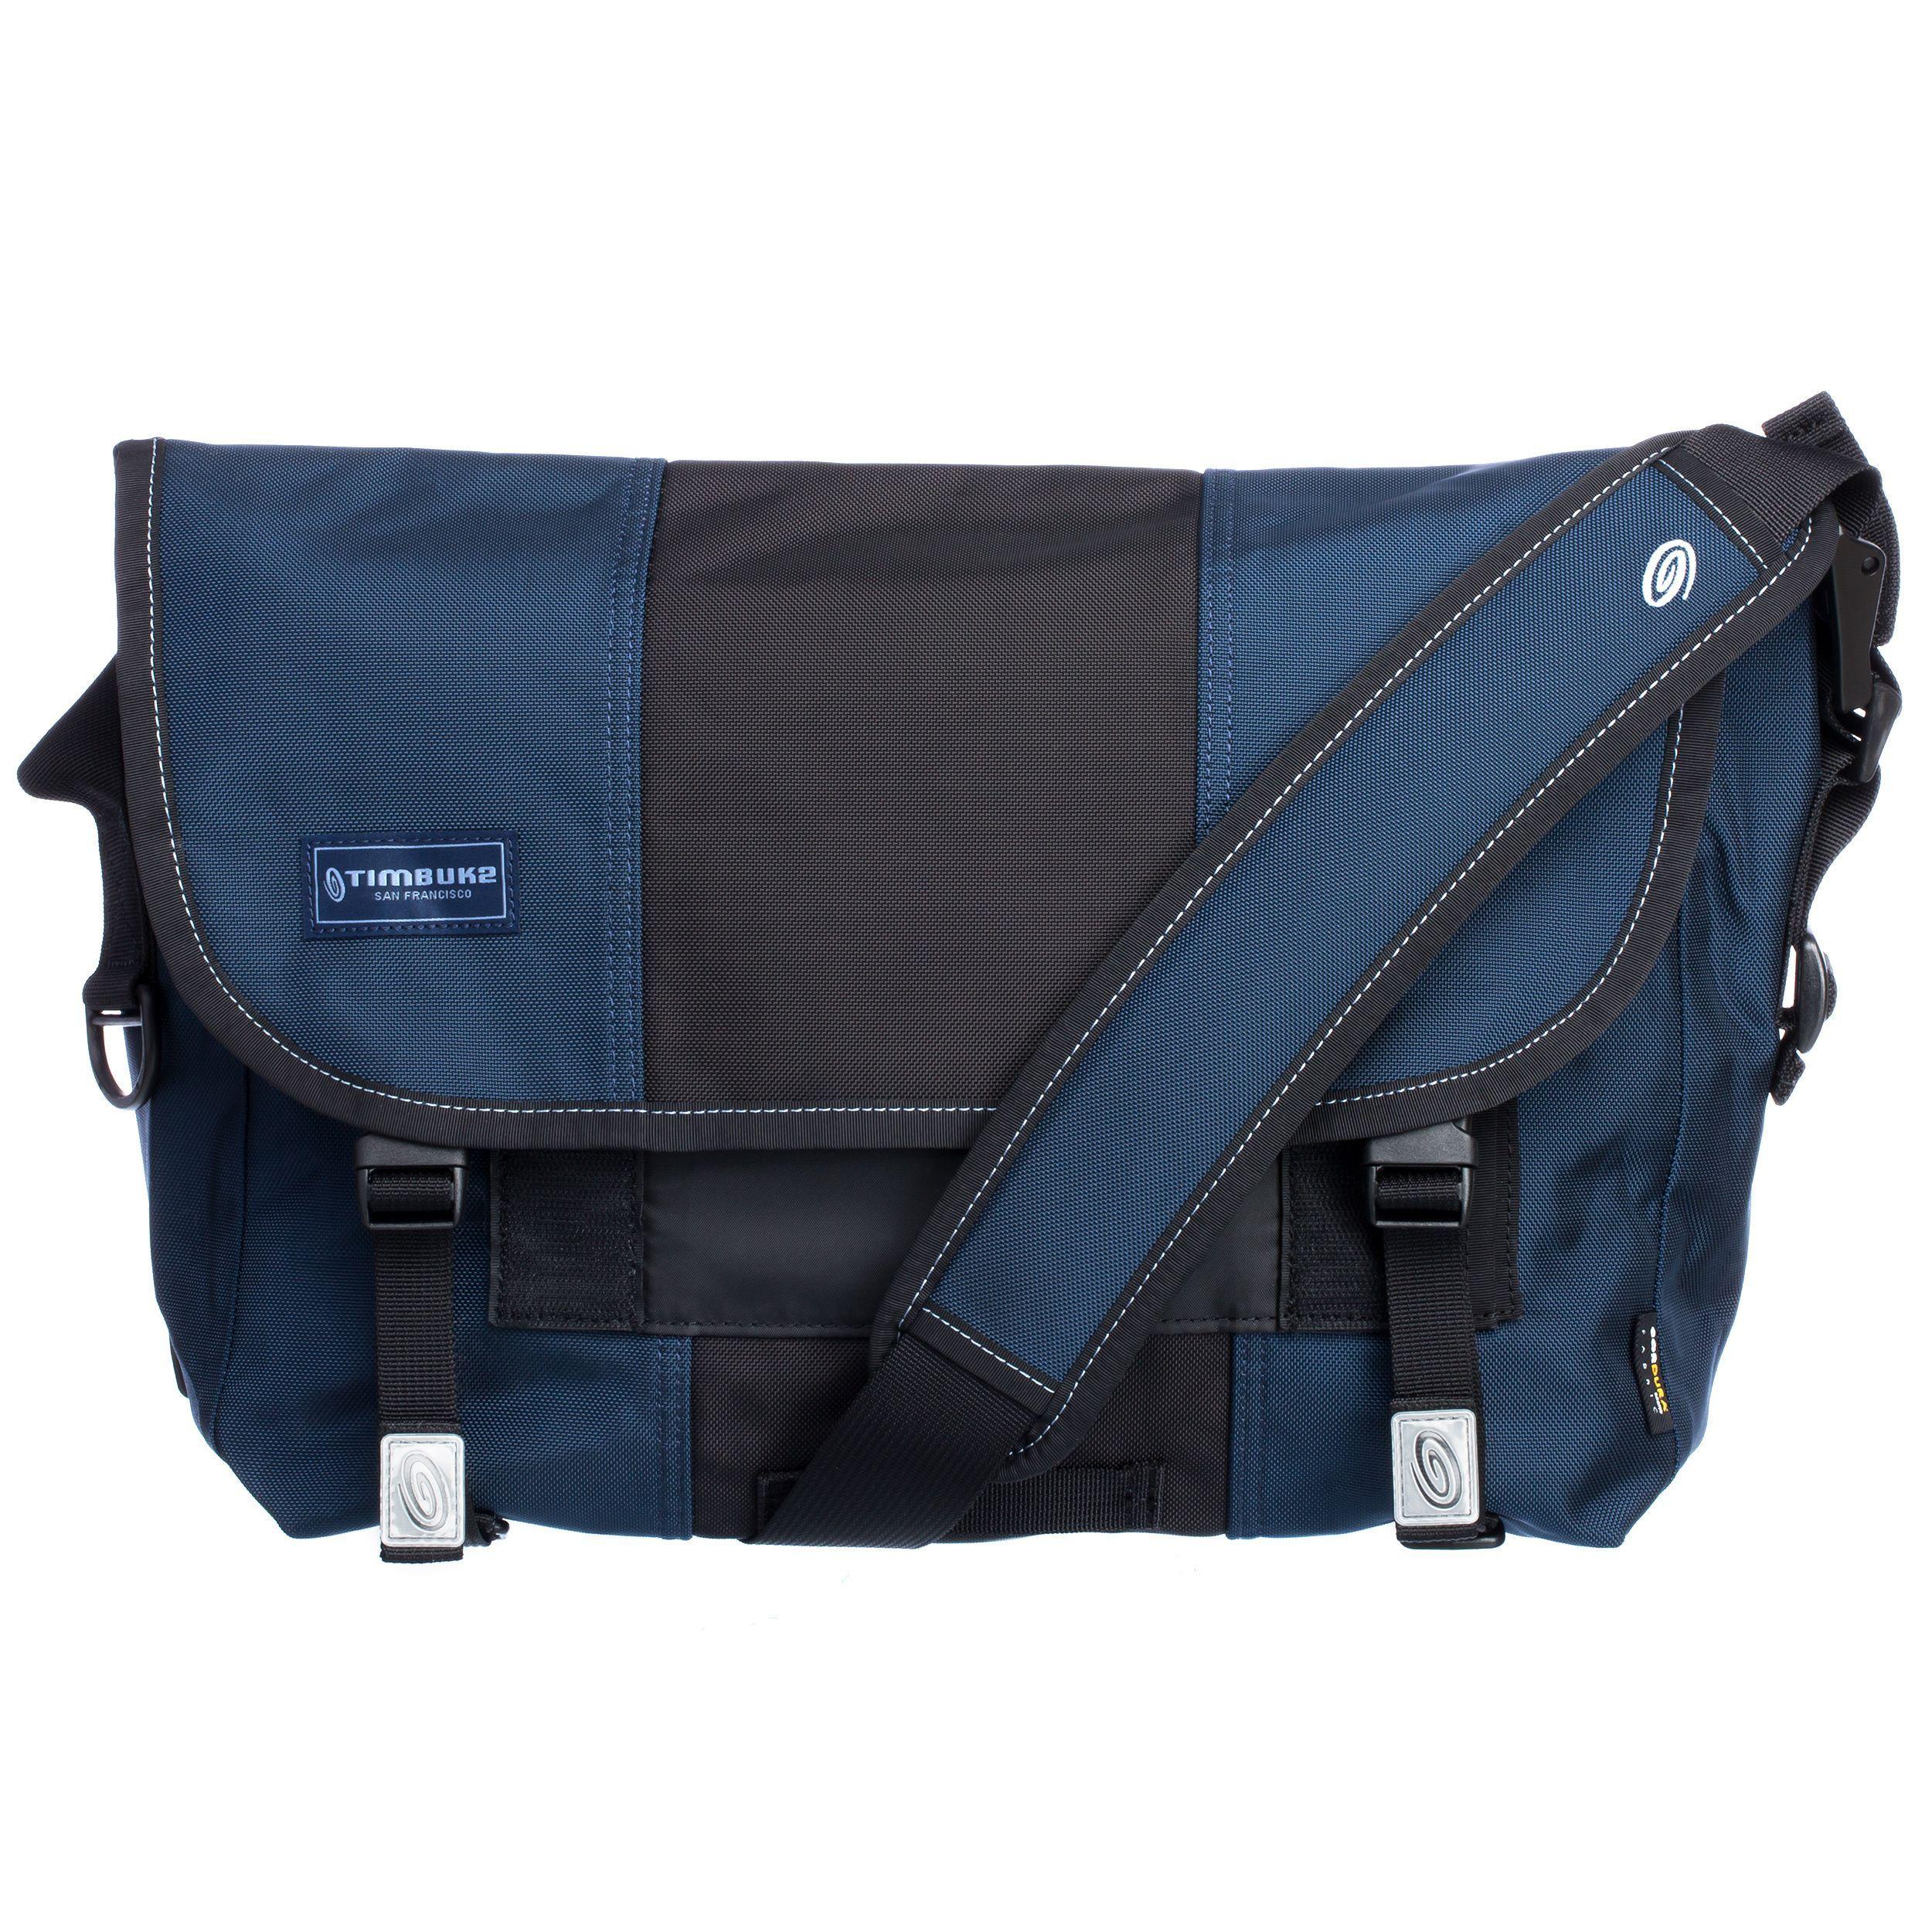 Timbuk2 Small Dusk Blue/ Classic Messenger Bag